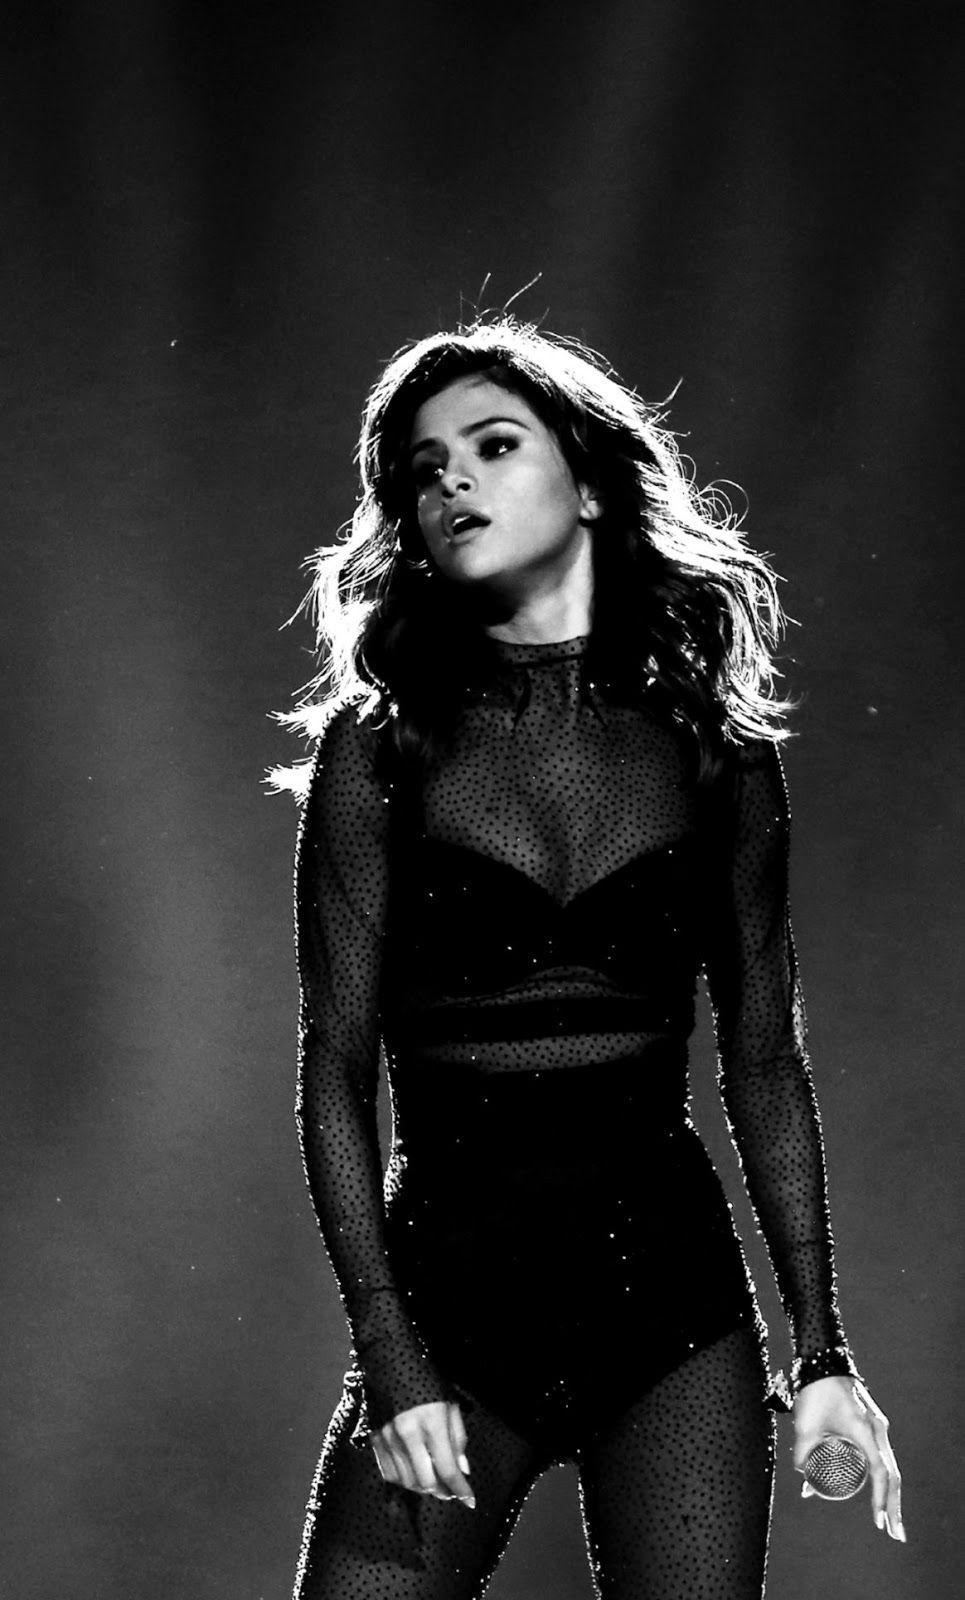 Selena Gomez Iphone Wallpapers Top Free Selena Gomez